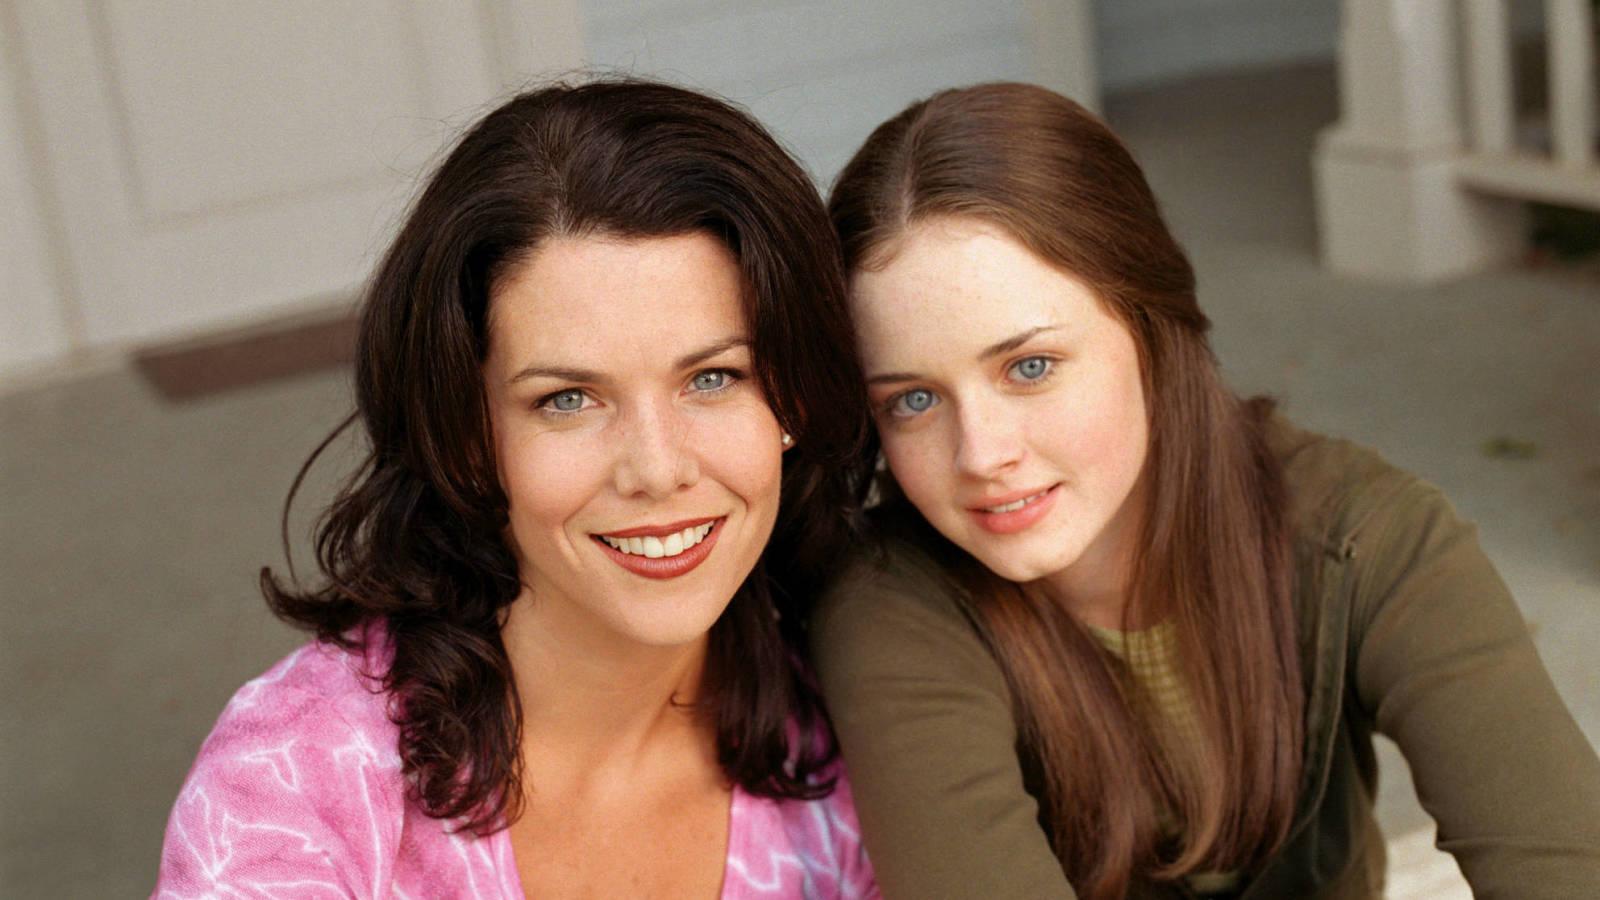 www.yardbarker.com: Lauren Graham marvels over 'Gilmore Girls' continued relevance: 'It's way more popular'